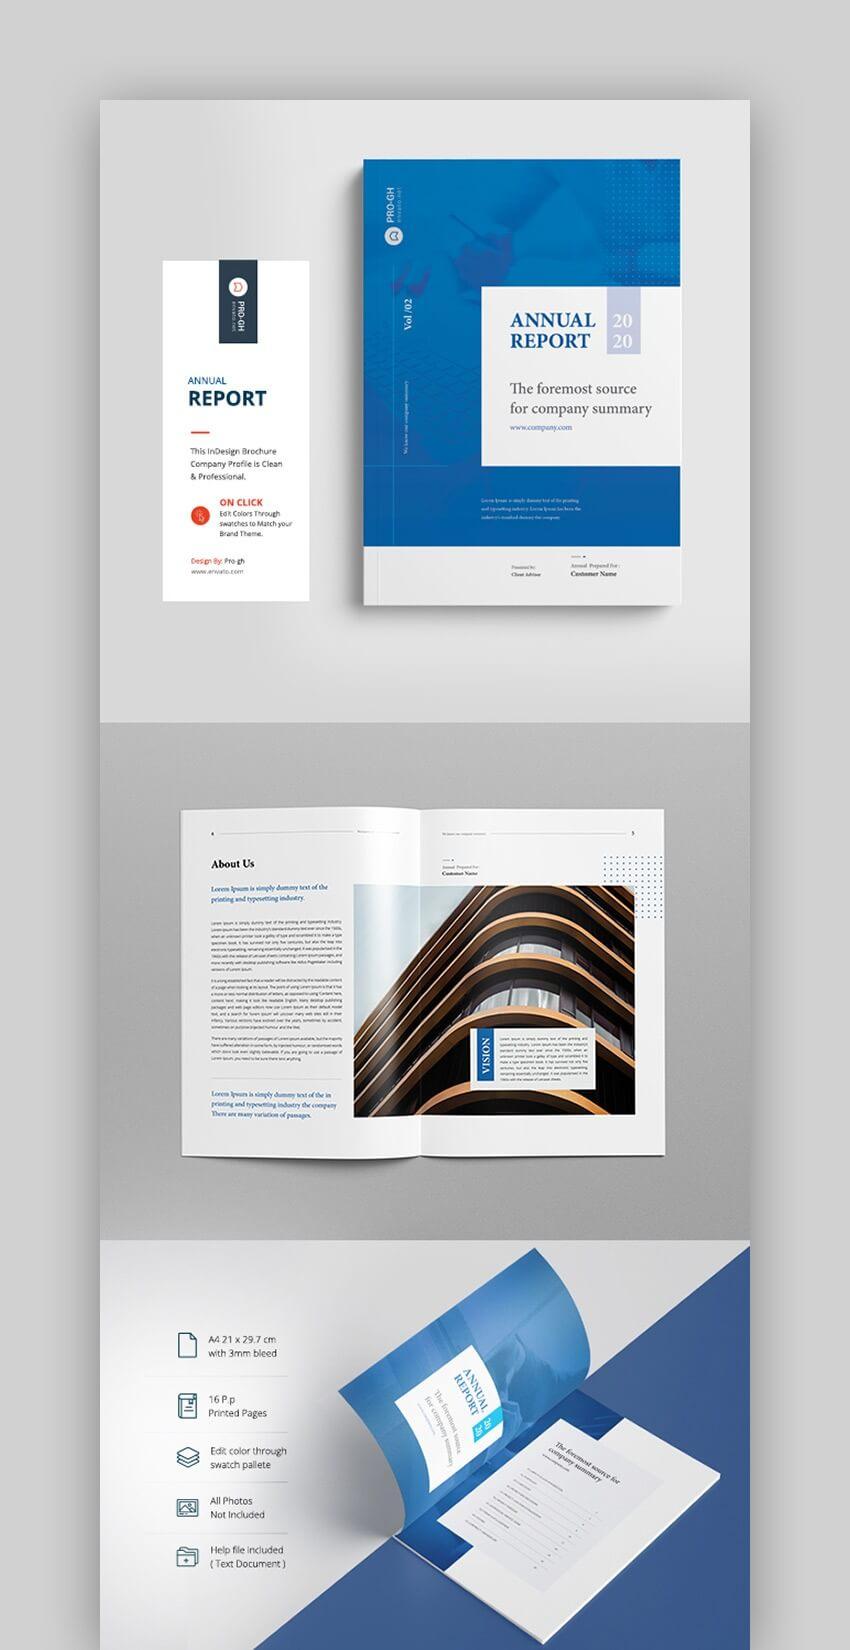 007 Annual Report Design Templates Template Ideas Staggering In Word Annual Report Template